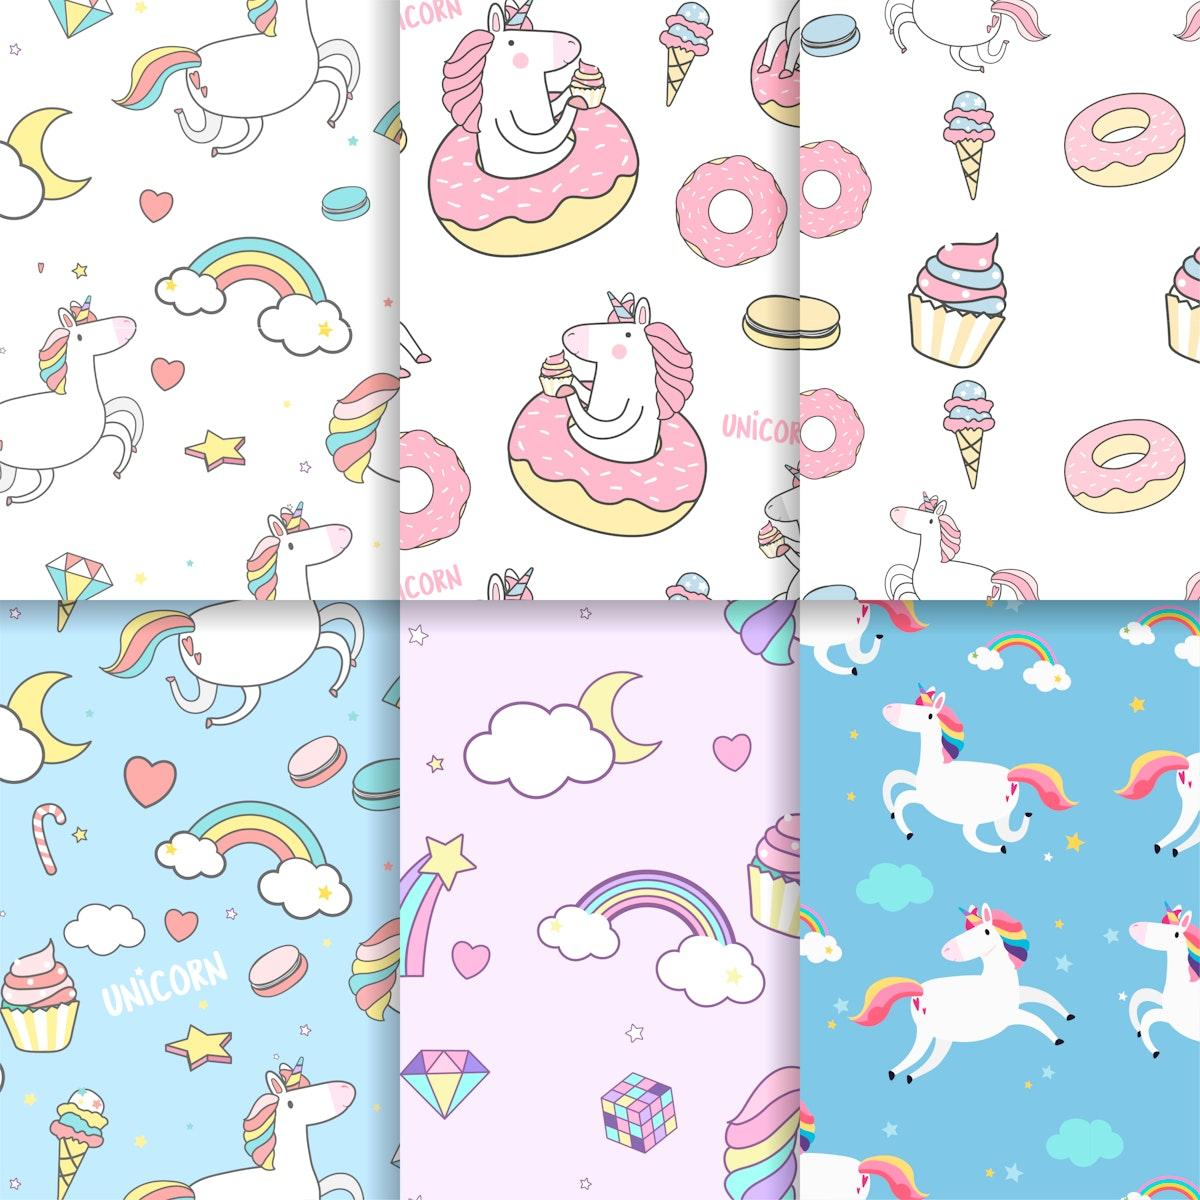 Colorful unicorn seamless pattern background vectors